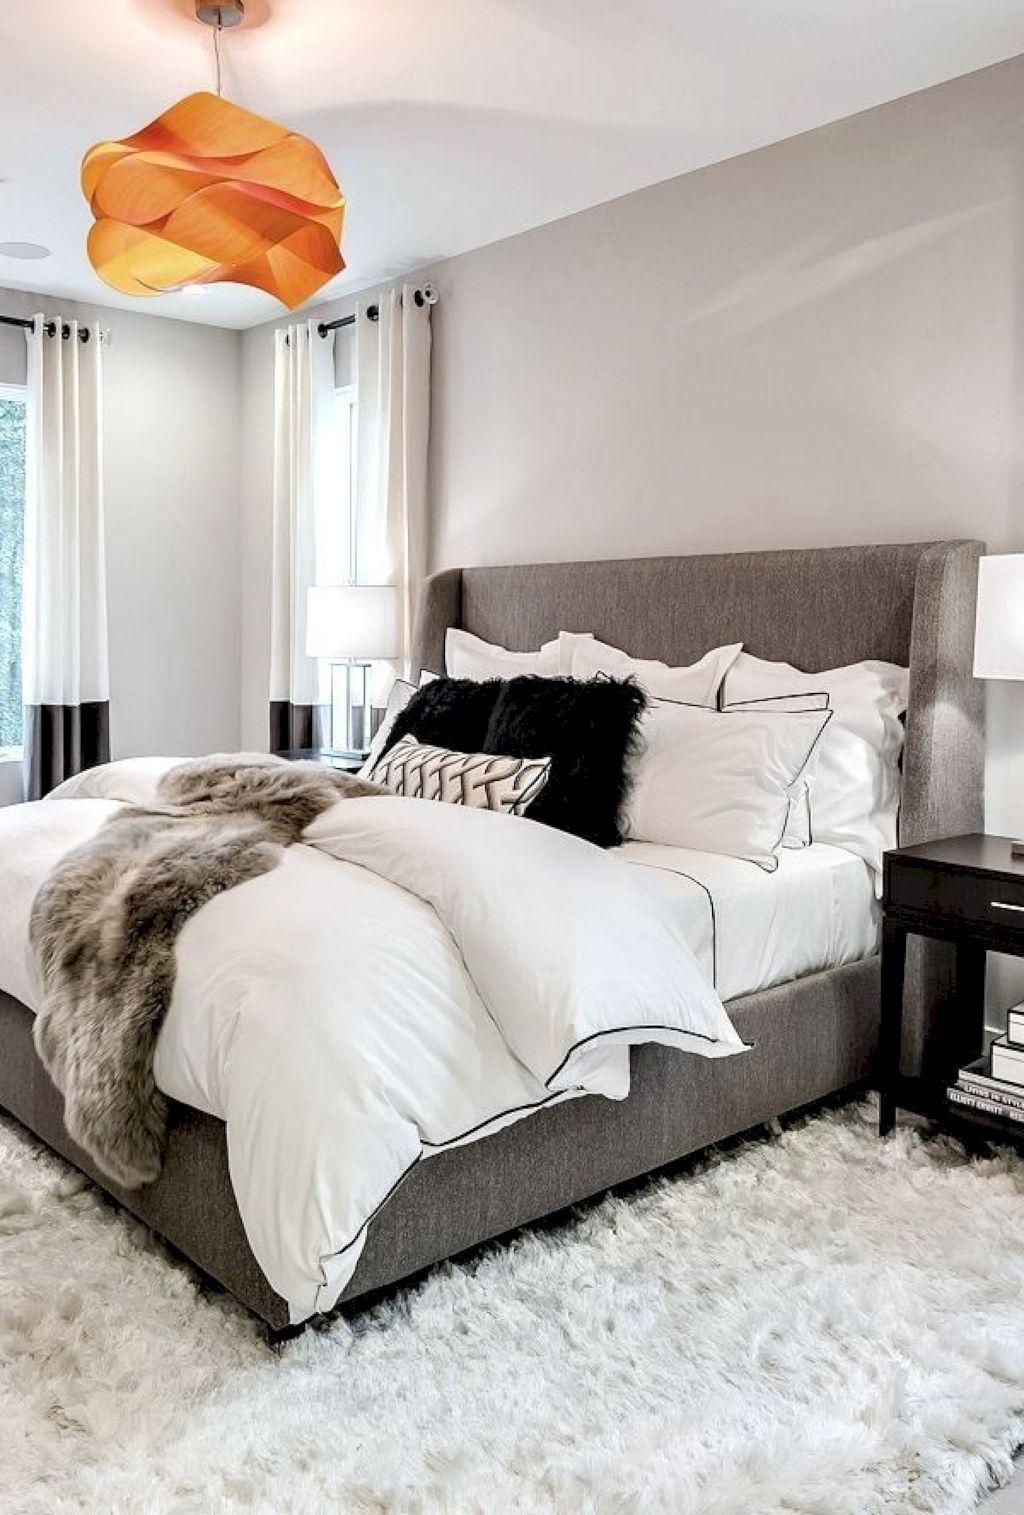 15 beautiful comfy bedroom decorating ideas cozy master on modern cozy bedroom decorating ideas id=42810